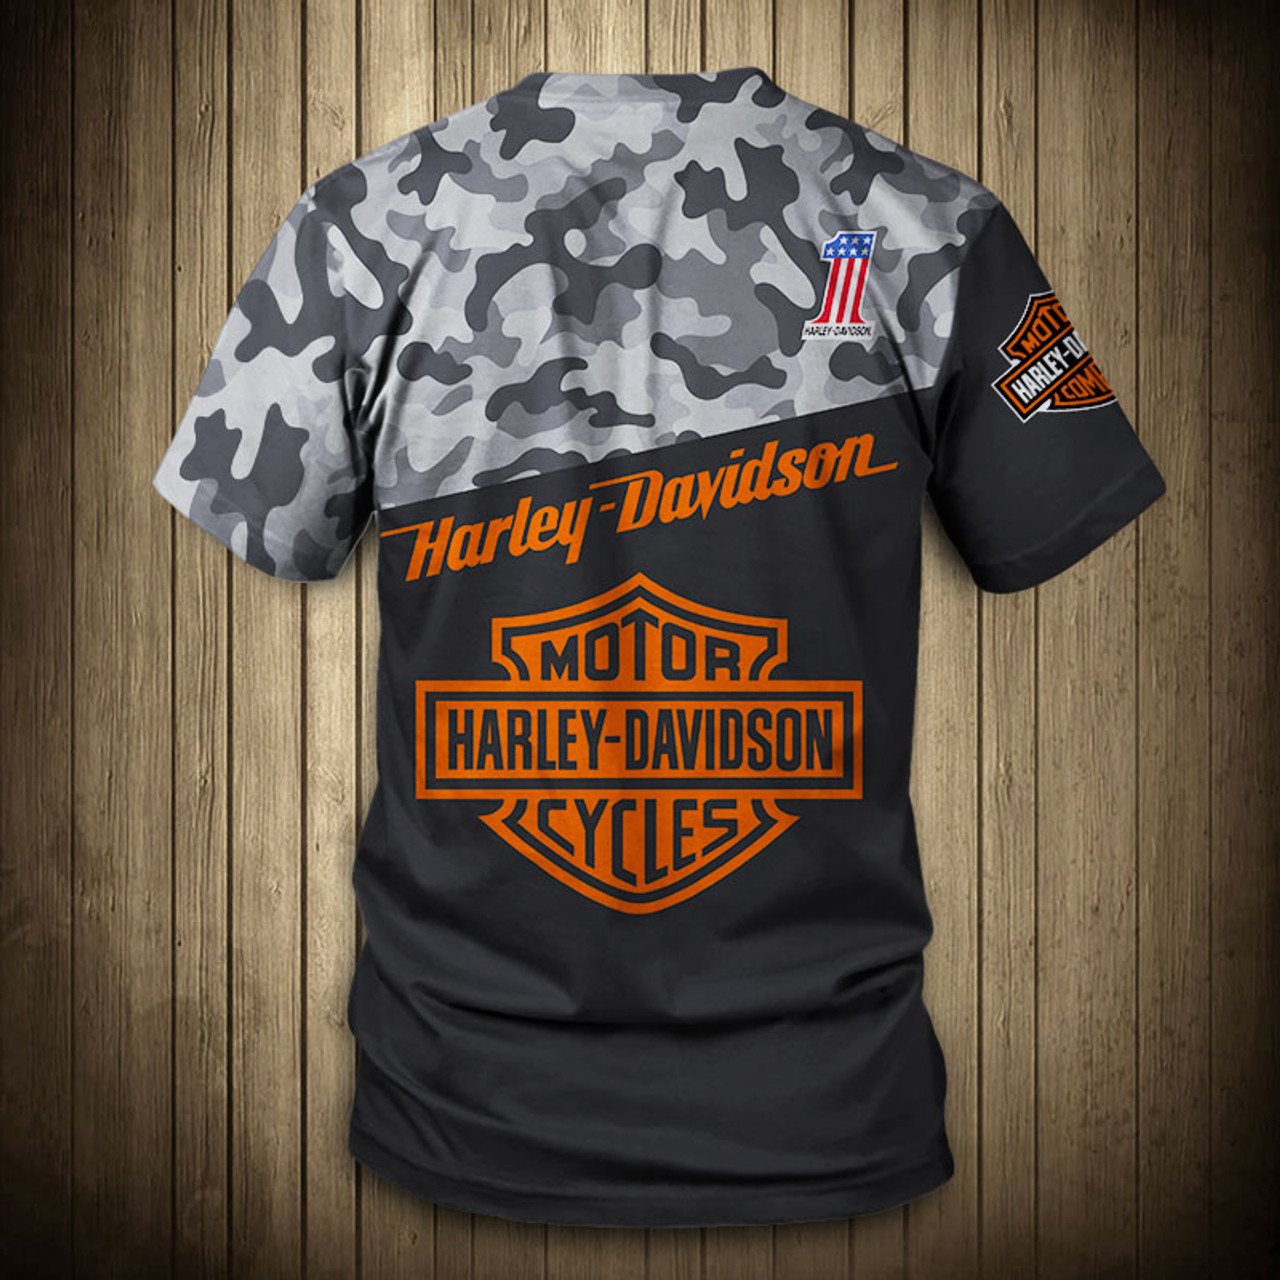 harley davidson hoodies,biker jackets,biker hats,biker skull caps,biker wear,biker apparel,biker clothing,mens & womens biker apparel,biker tees,biker hoodies,biker helmets,biker leather jackets,biker vests,biker attire,official biker wear,official biker apparel,biker gloves,riding gloves,biker riding apparel